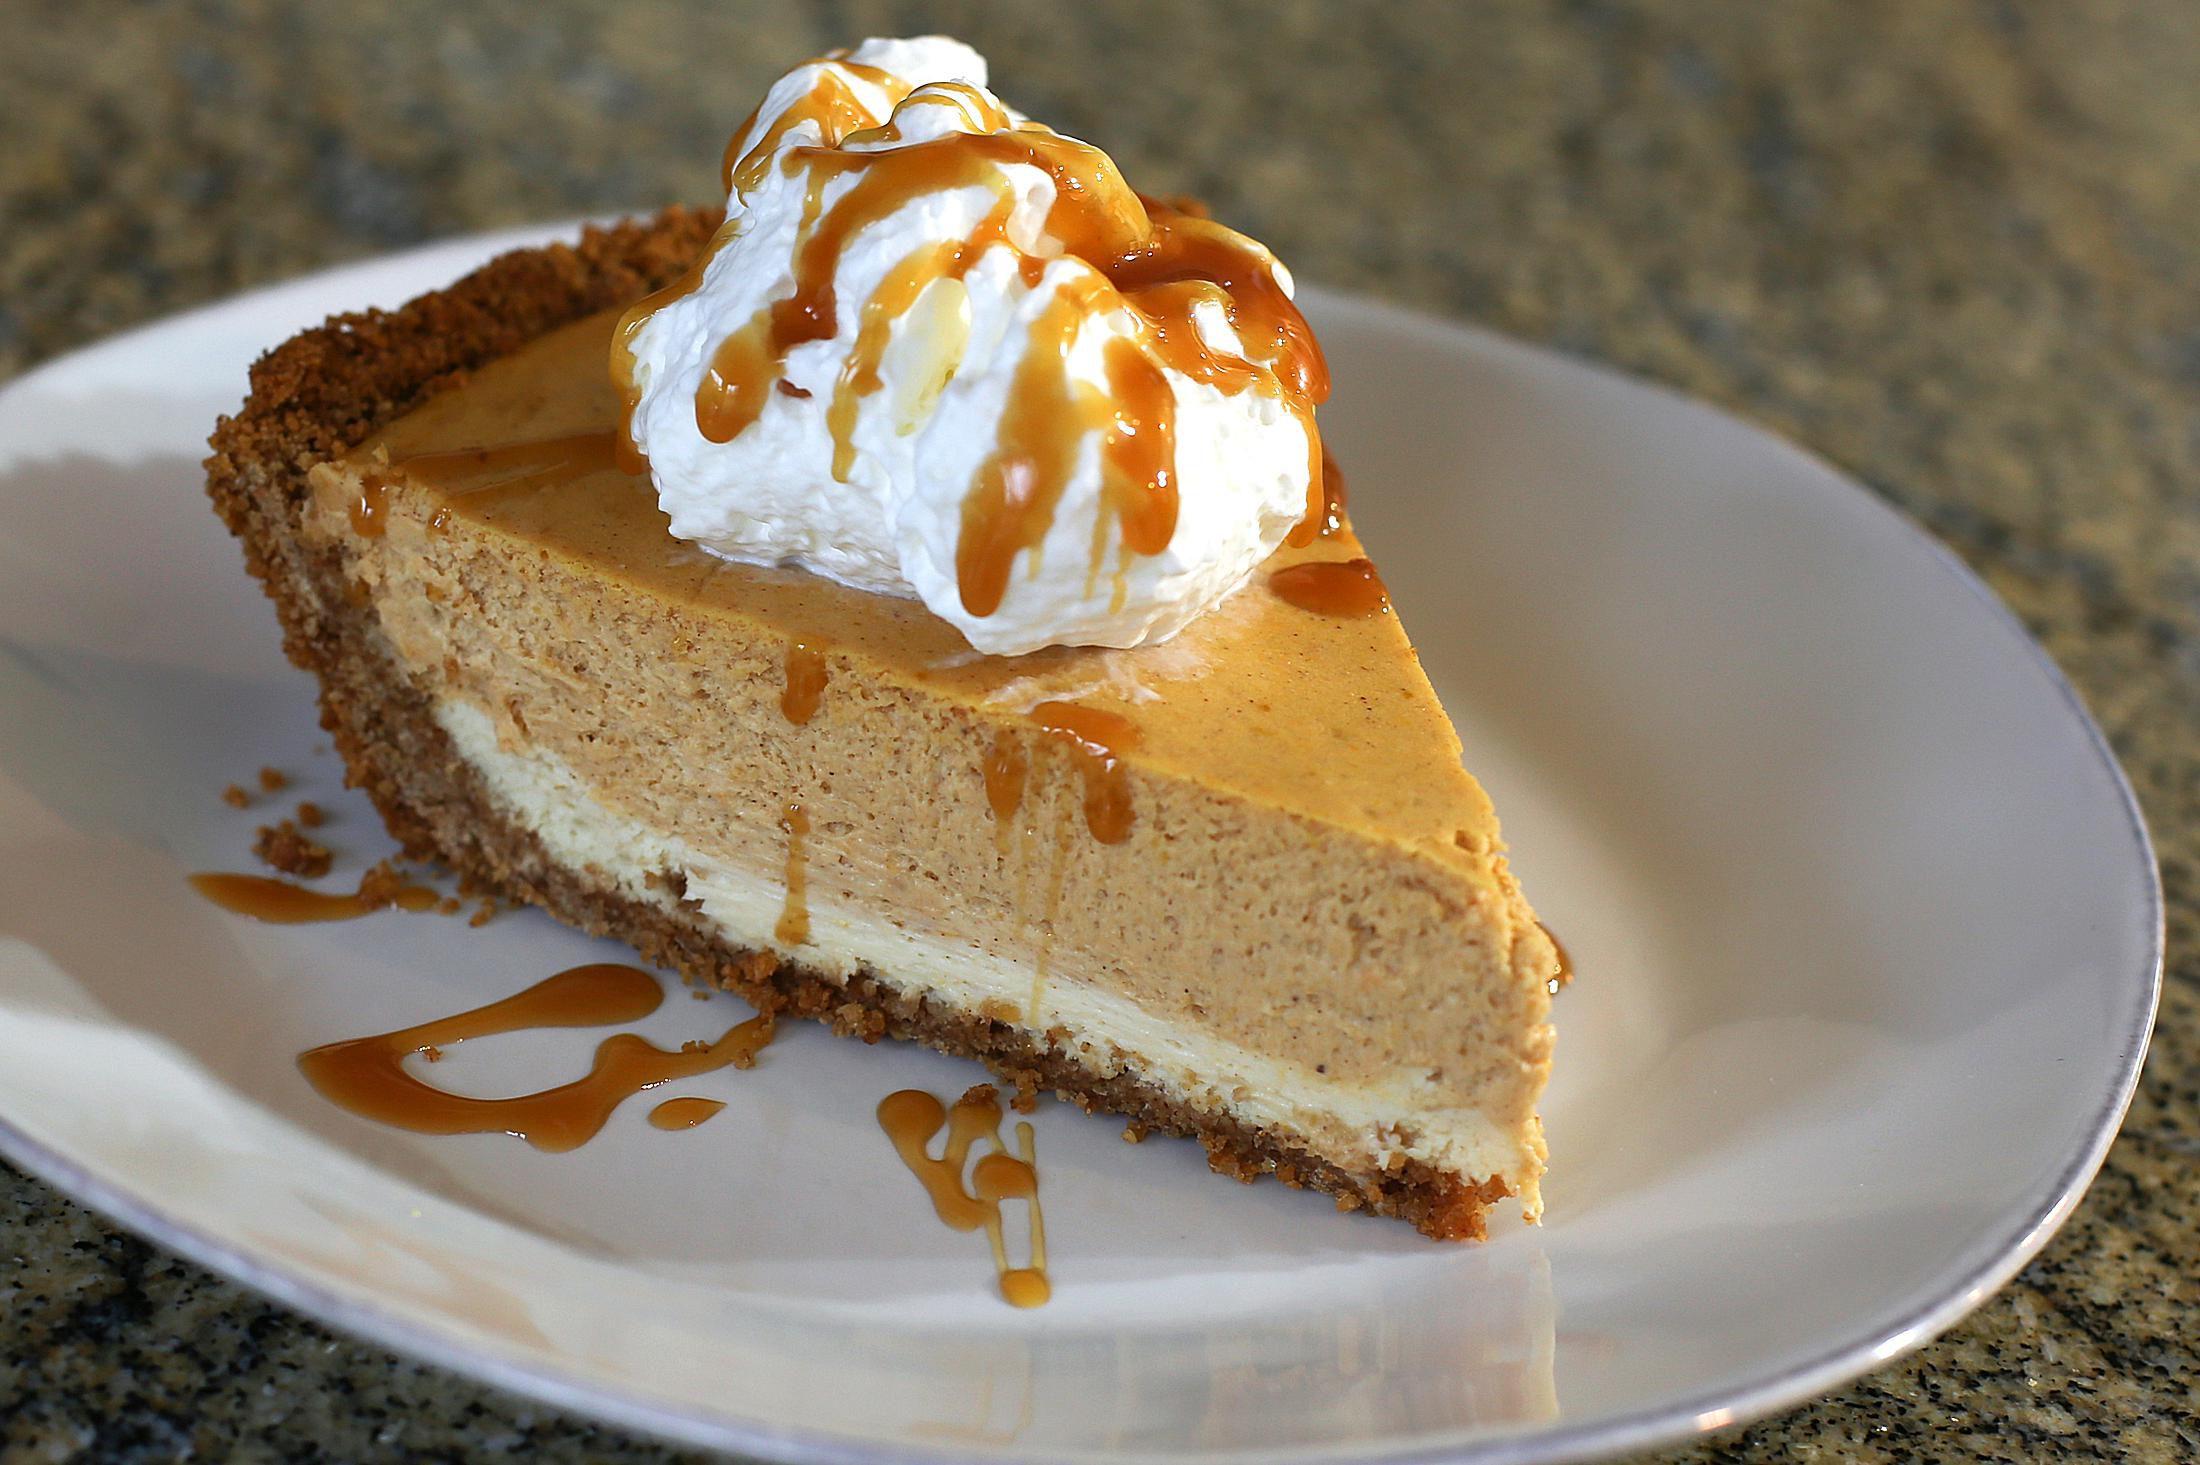 How to Make an Amazing Homemade Pumpkin Cheesecake